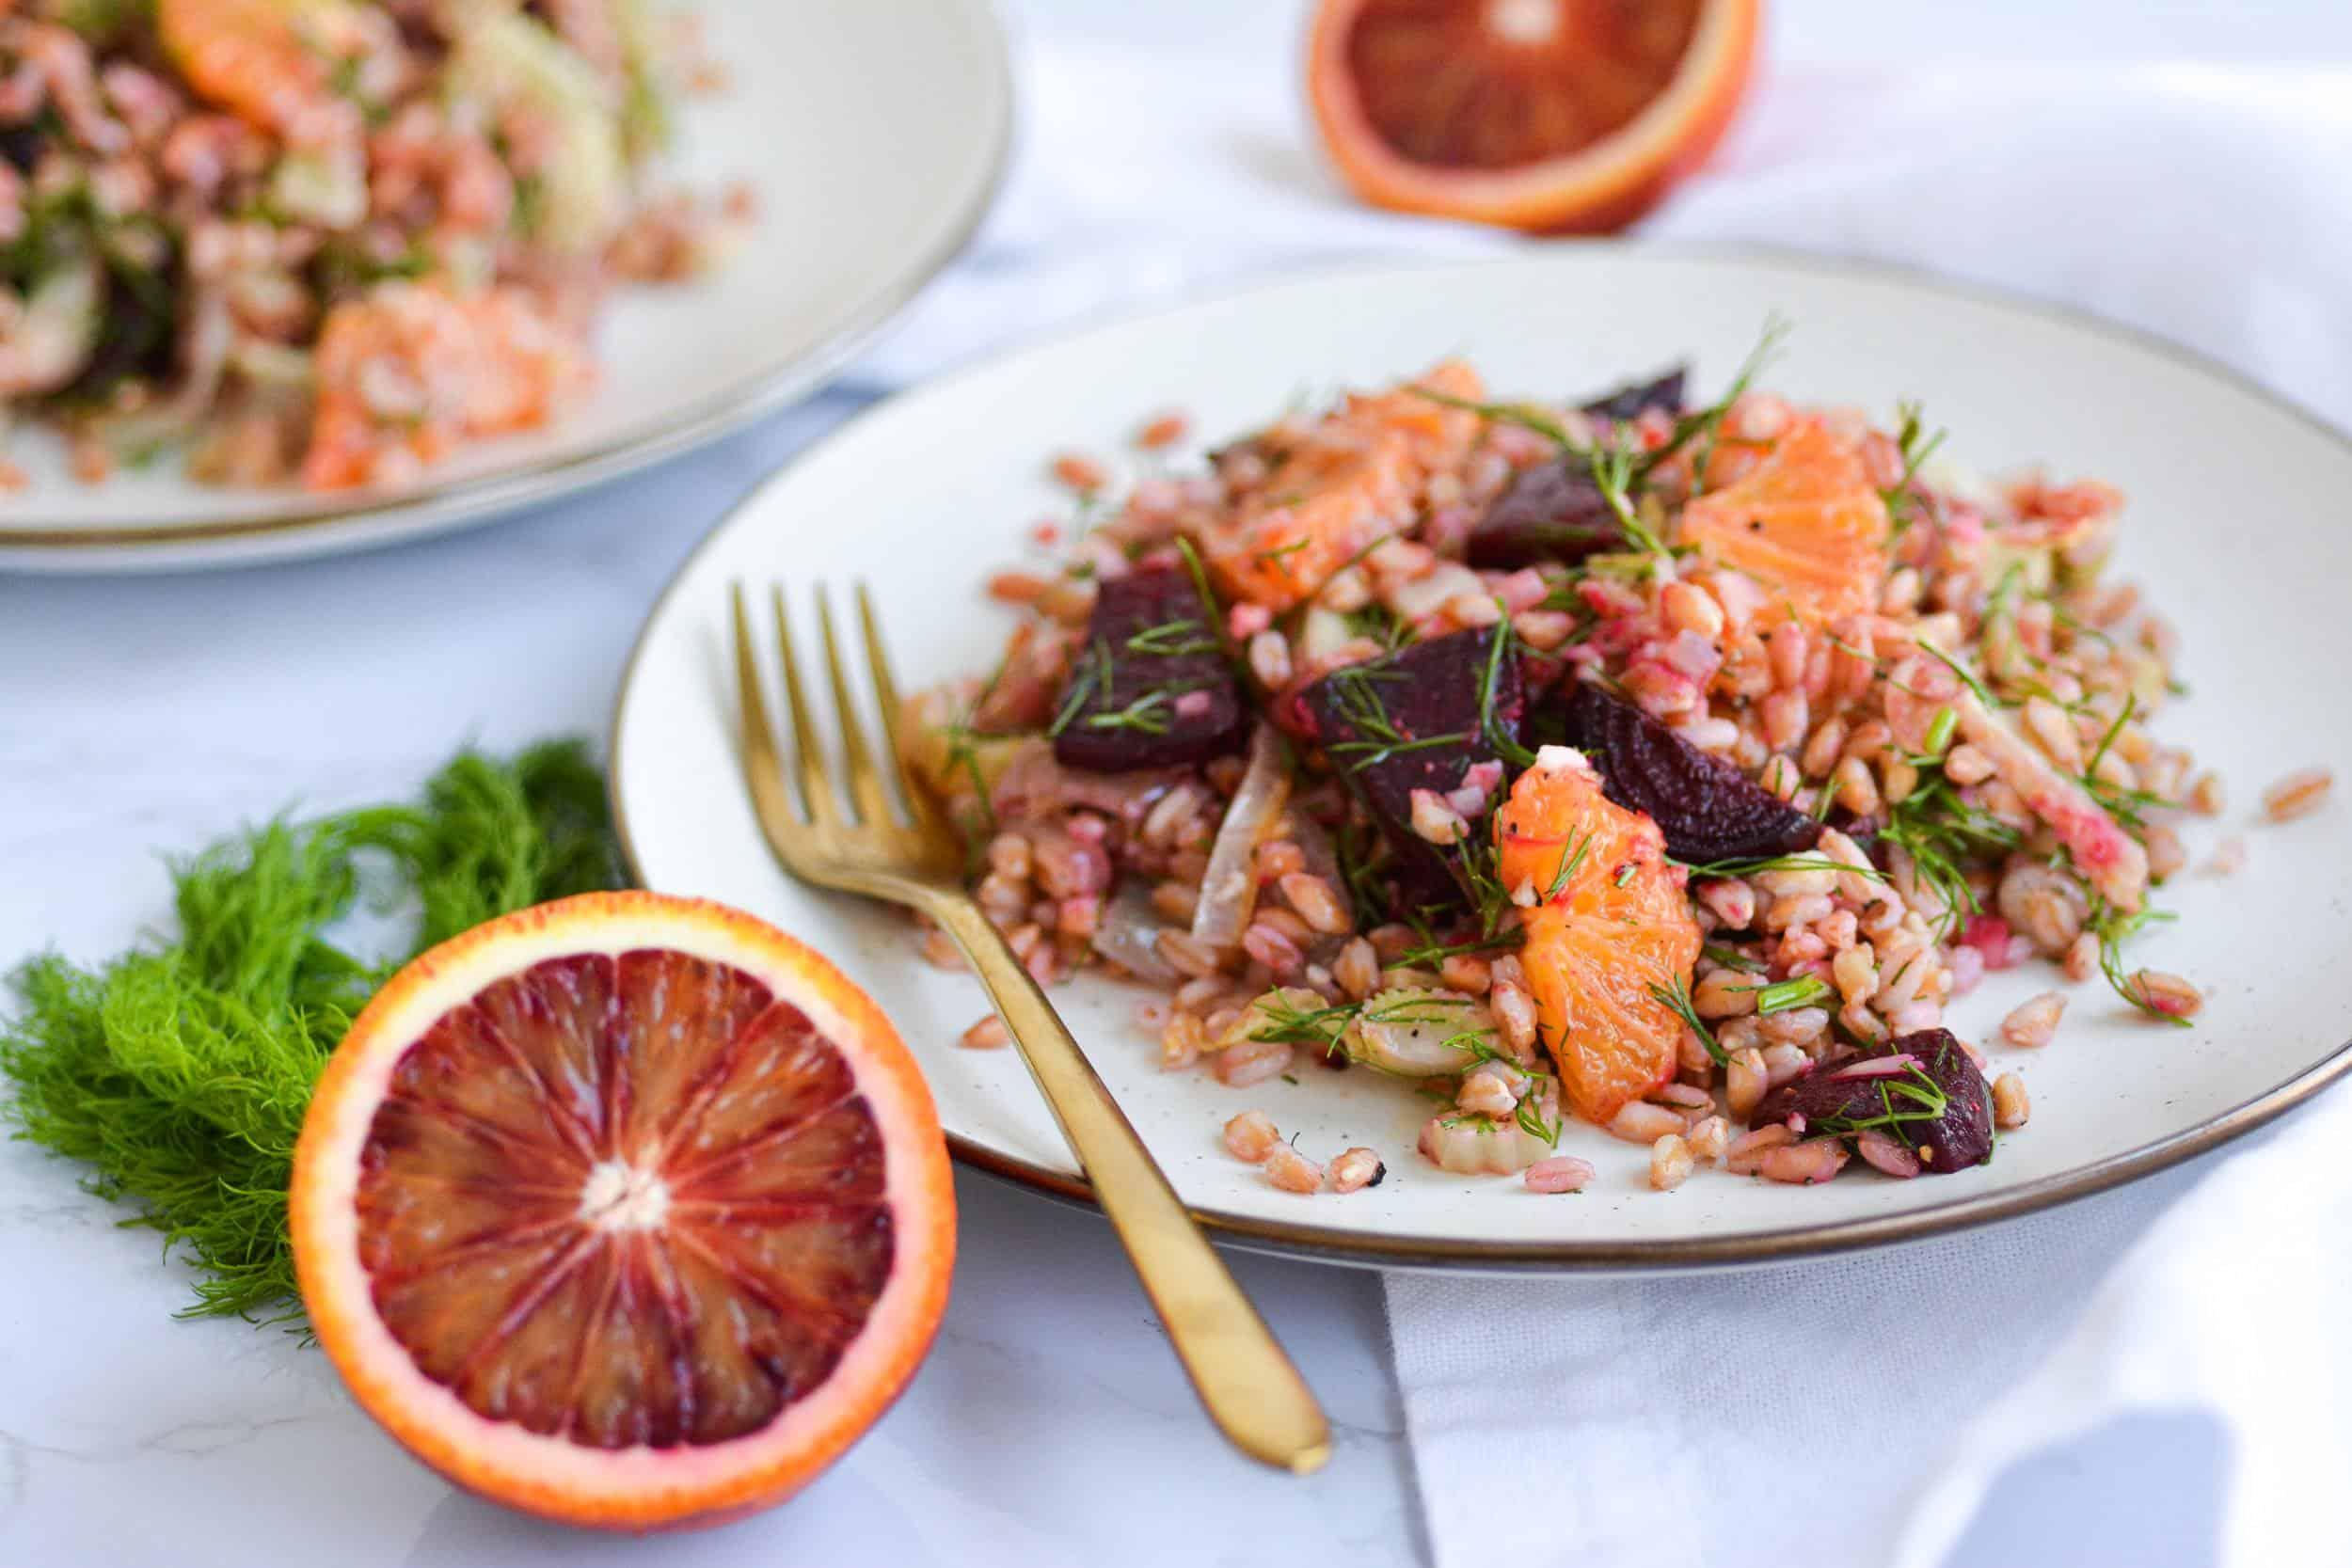 Warm Farro Salad with Roasted Garlic Vinaigrette